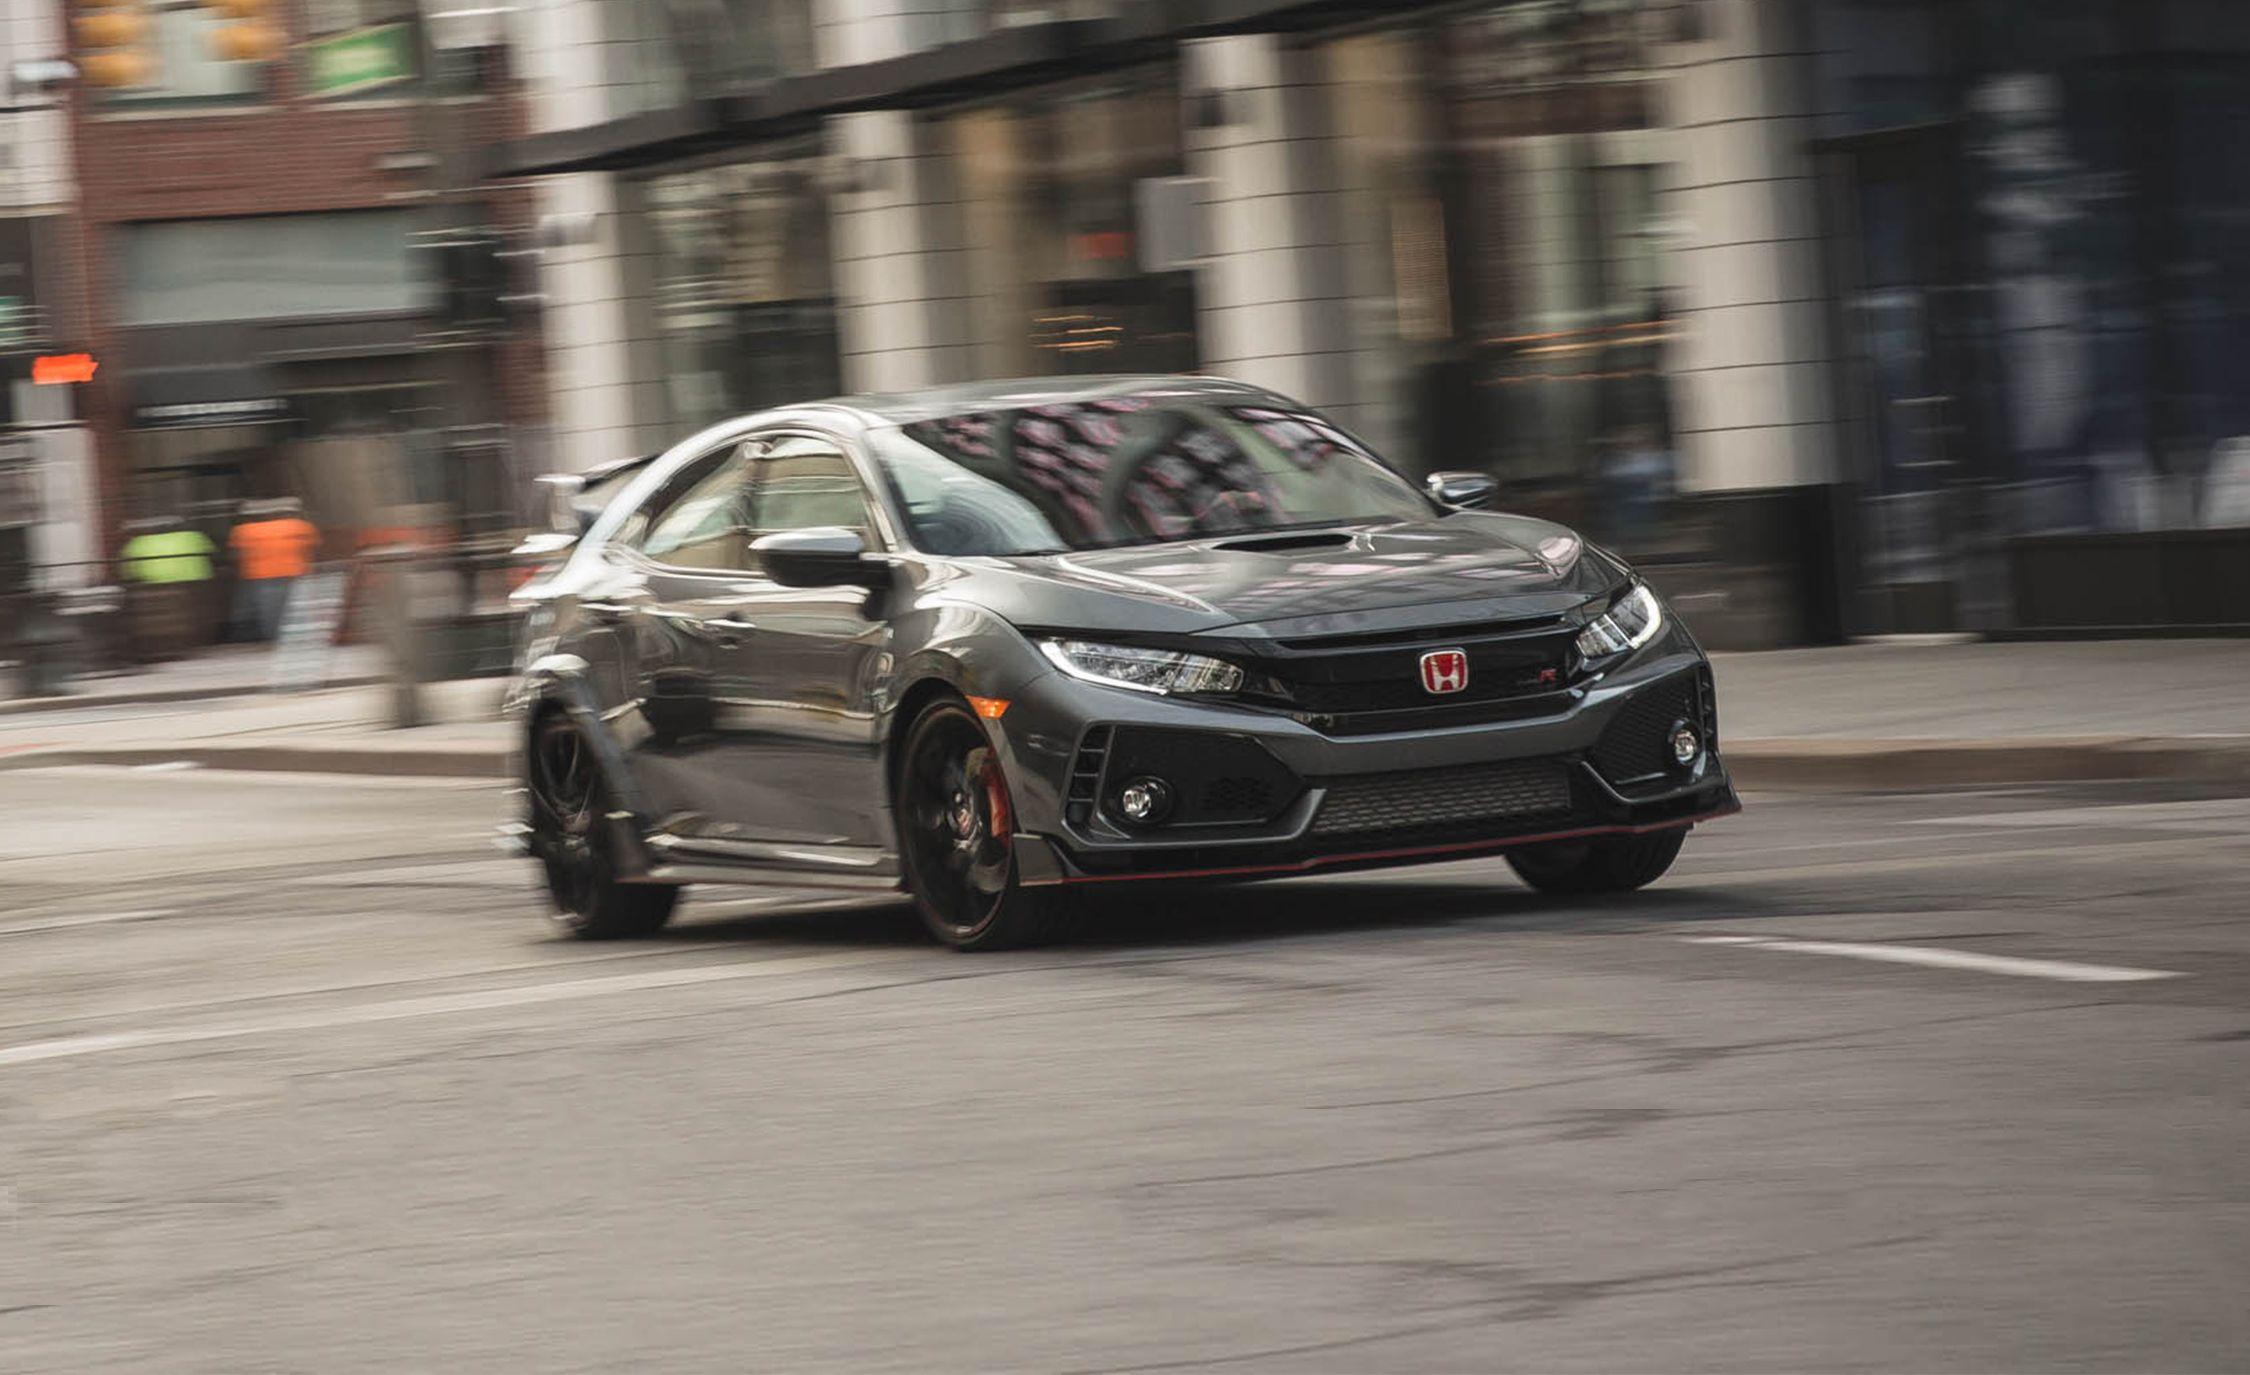 2017 Honda Civic Type R   In-Depth Model Review   Car and Driver